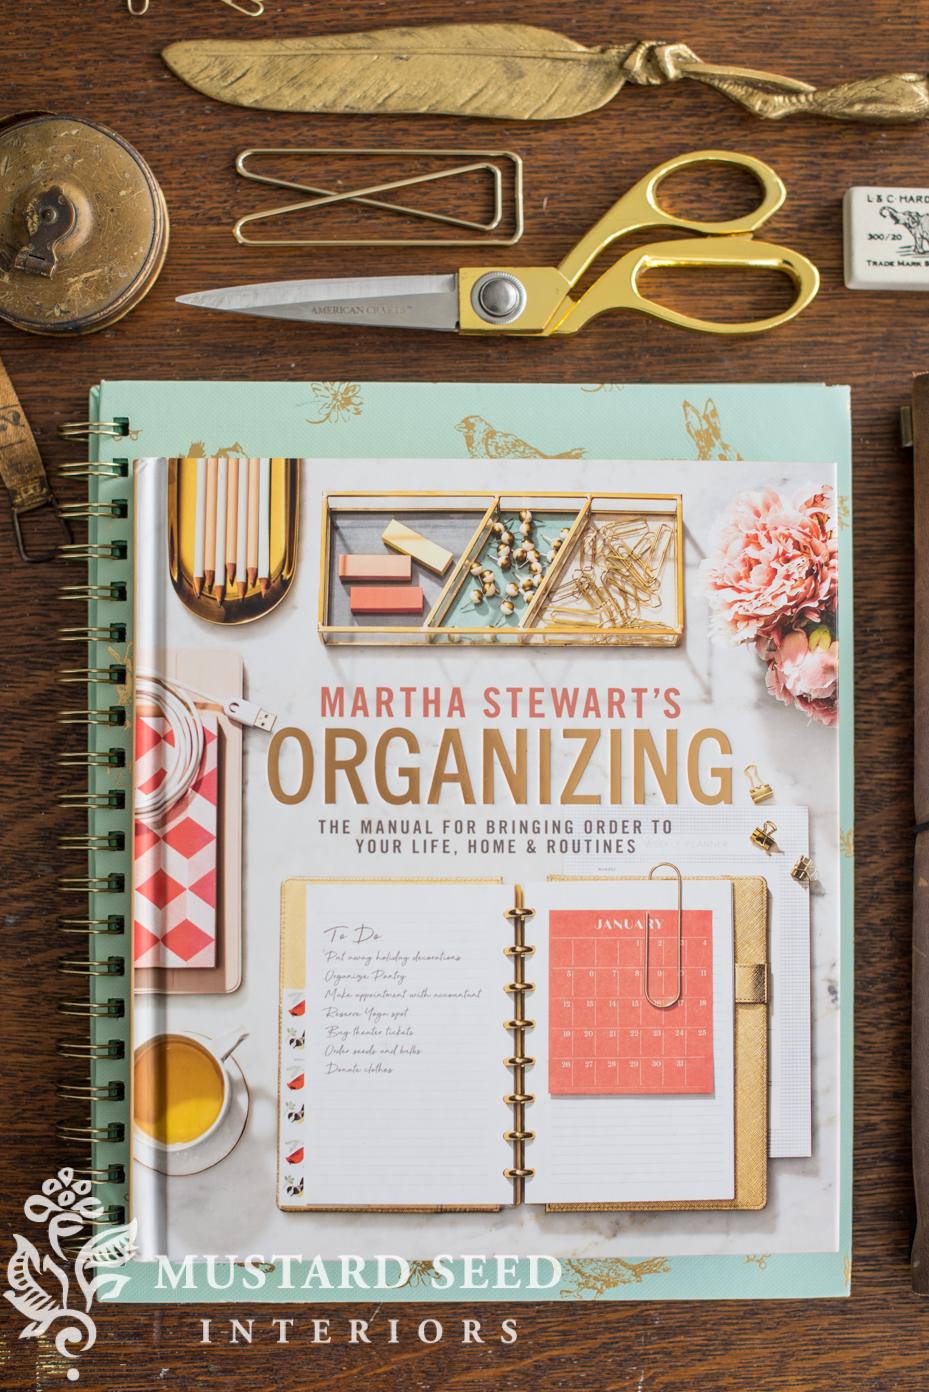 marthat stewart's organizing   miss mustard seed